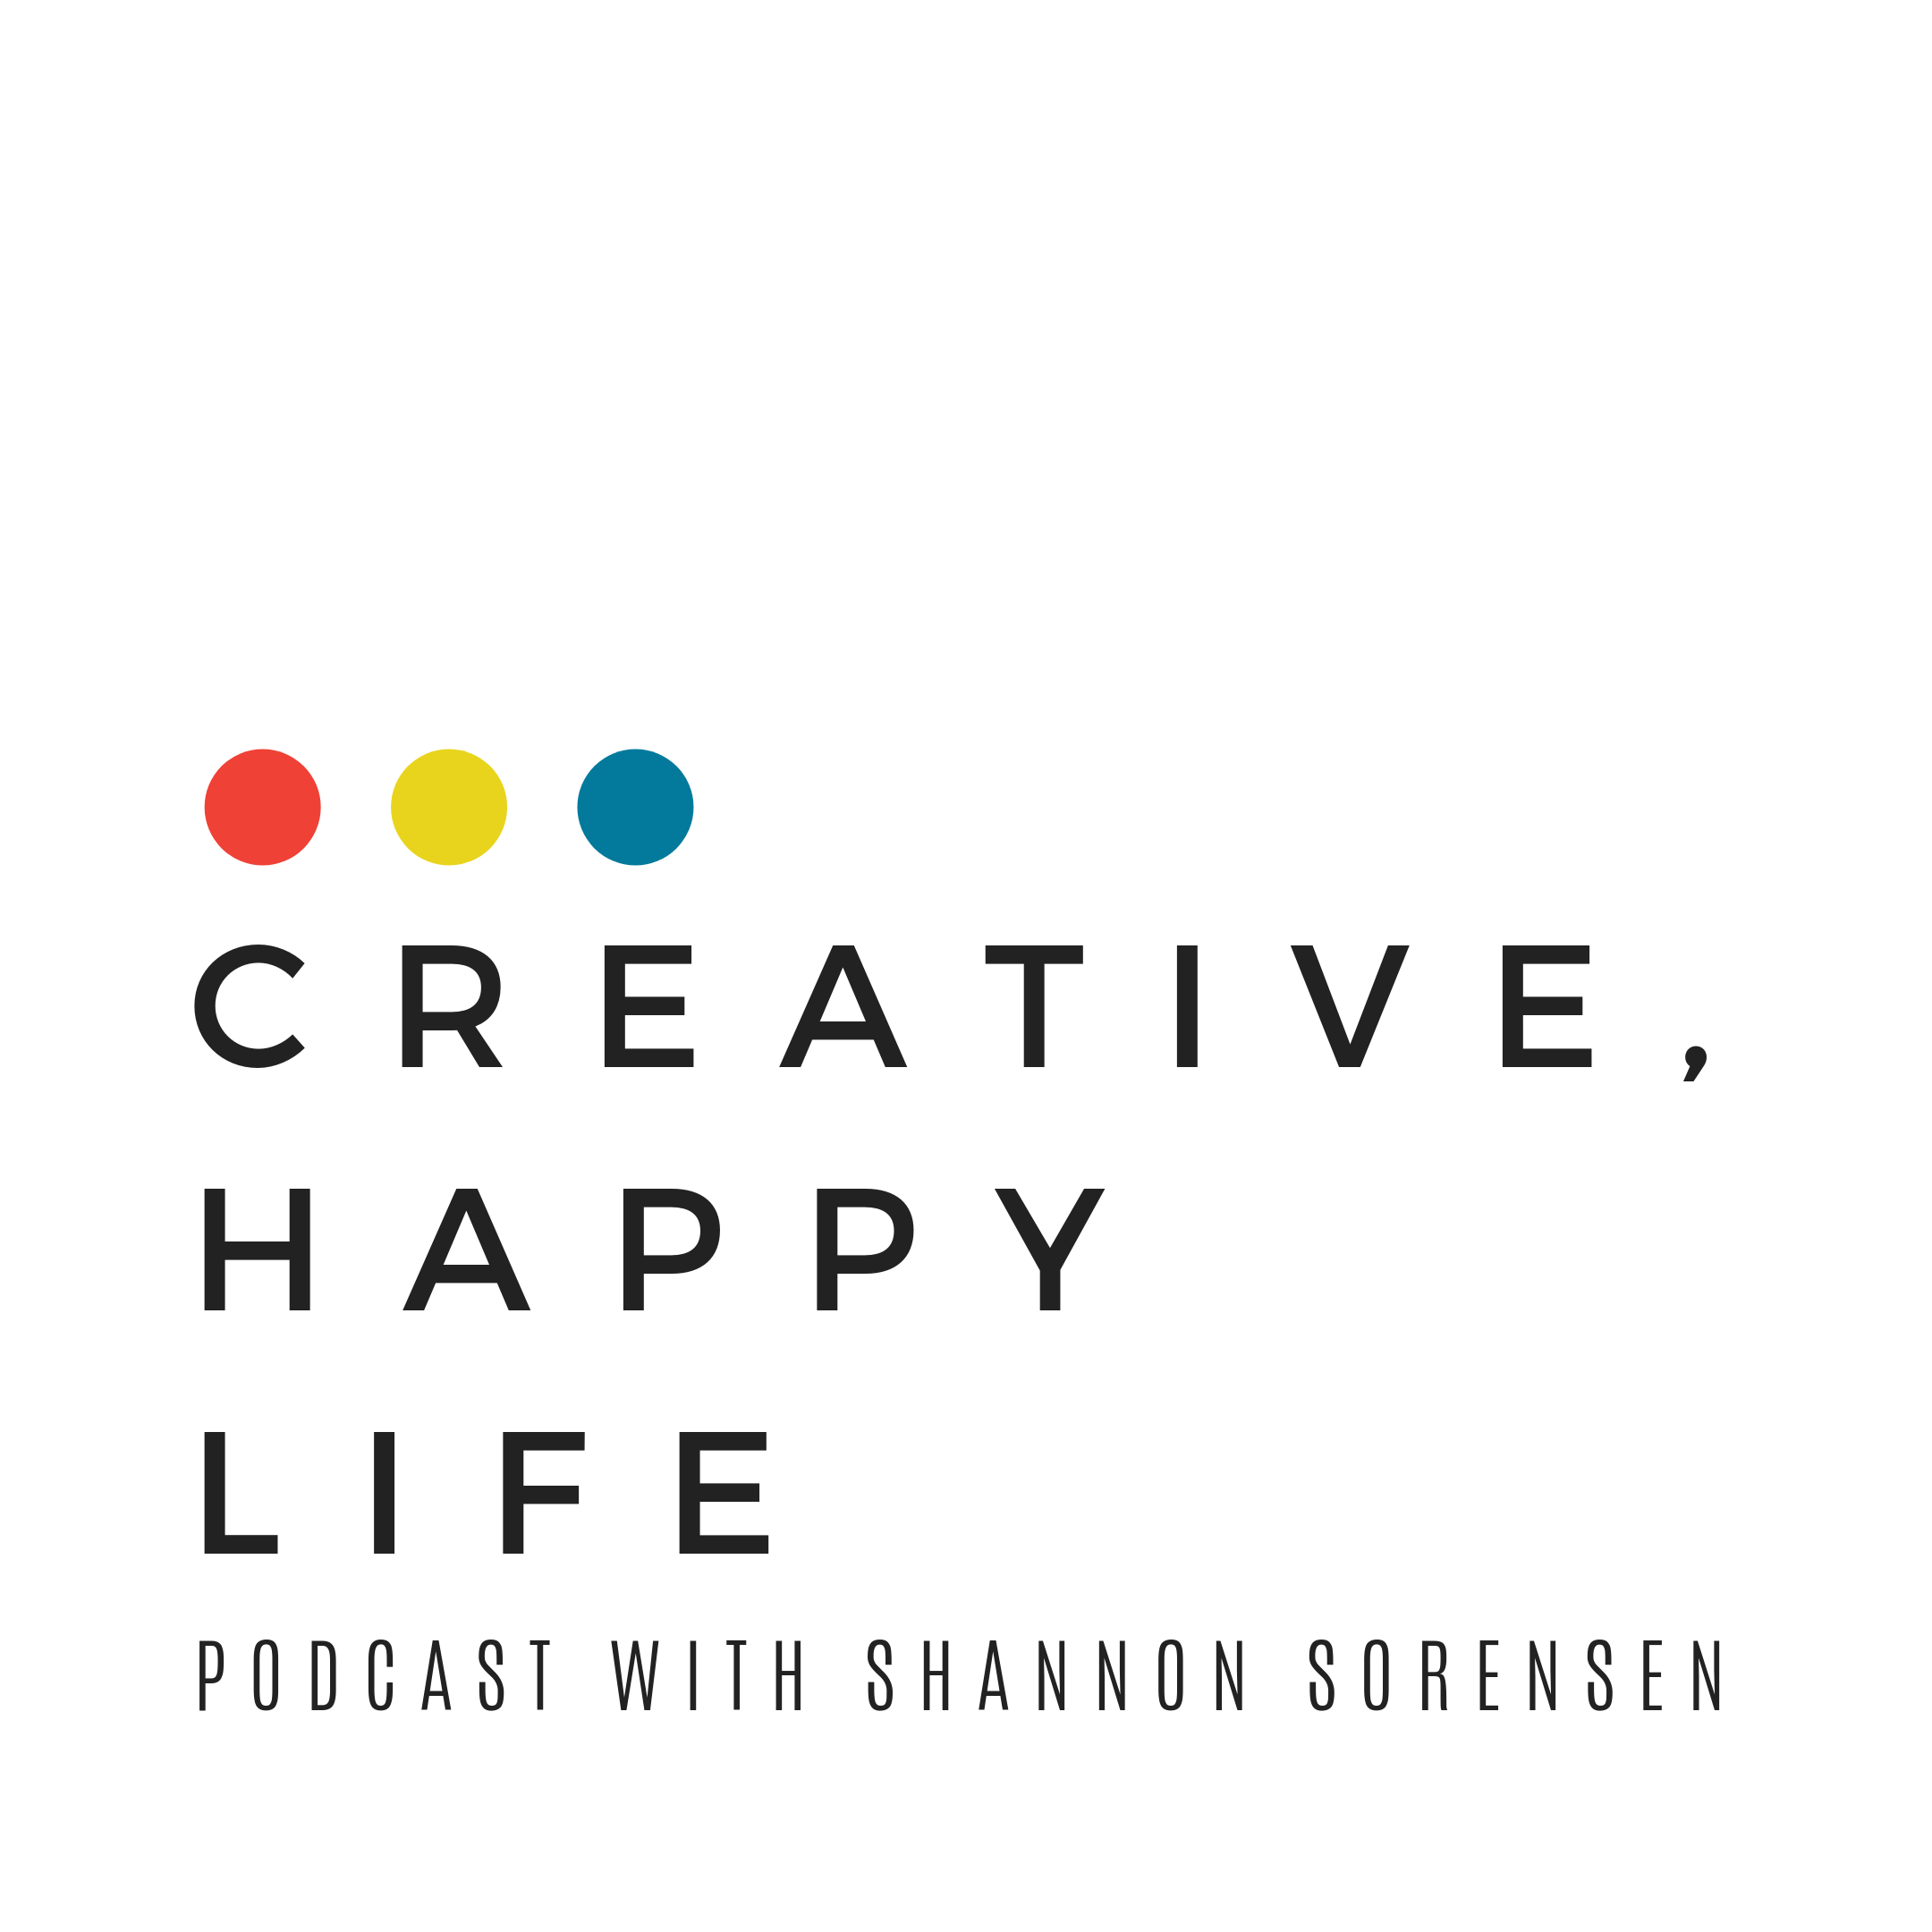 CREATIVE,HAPPY LIFE.png